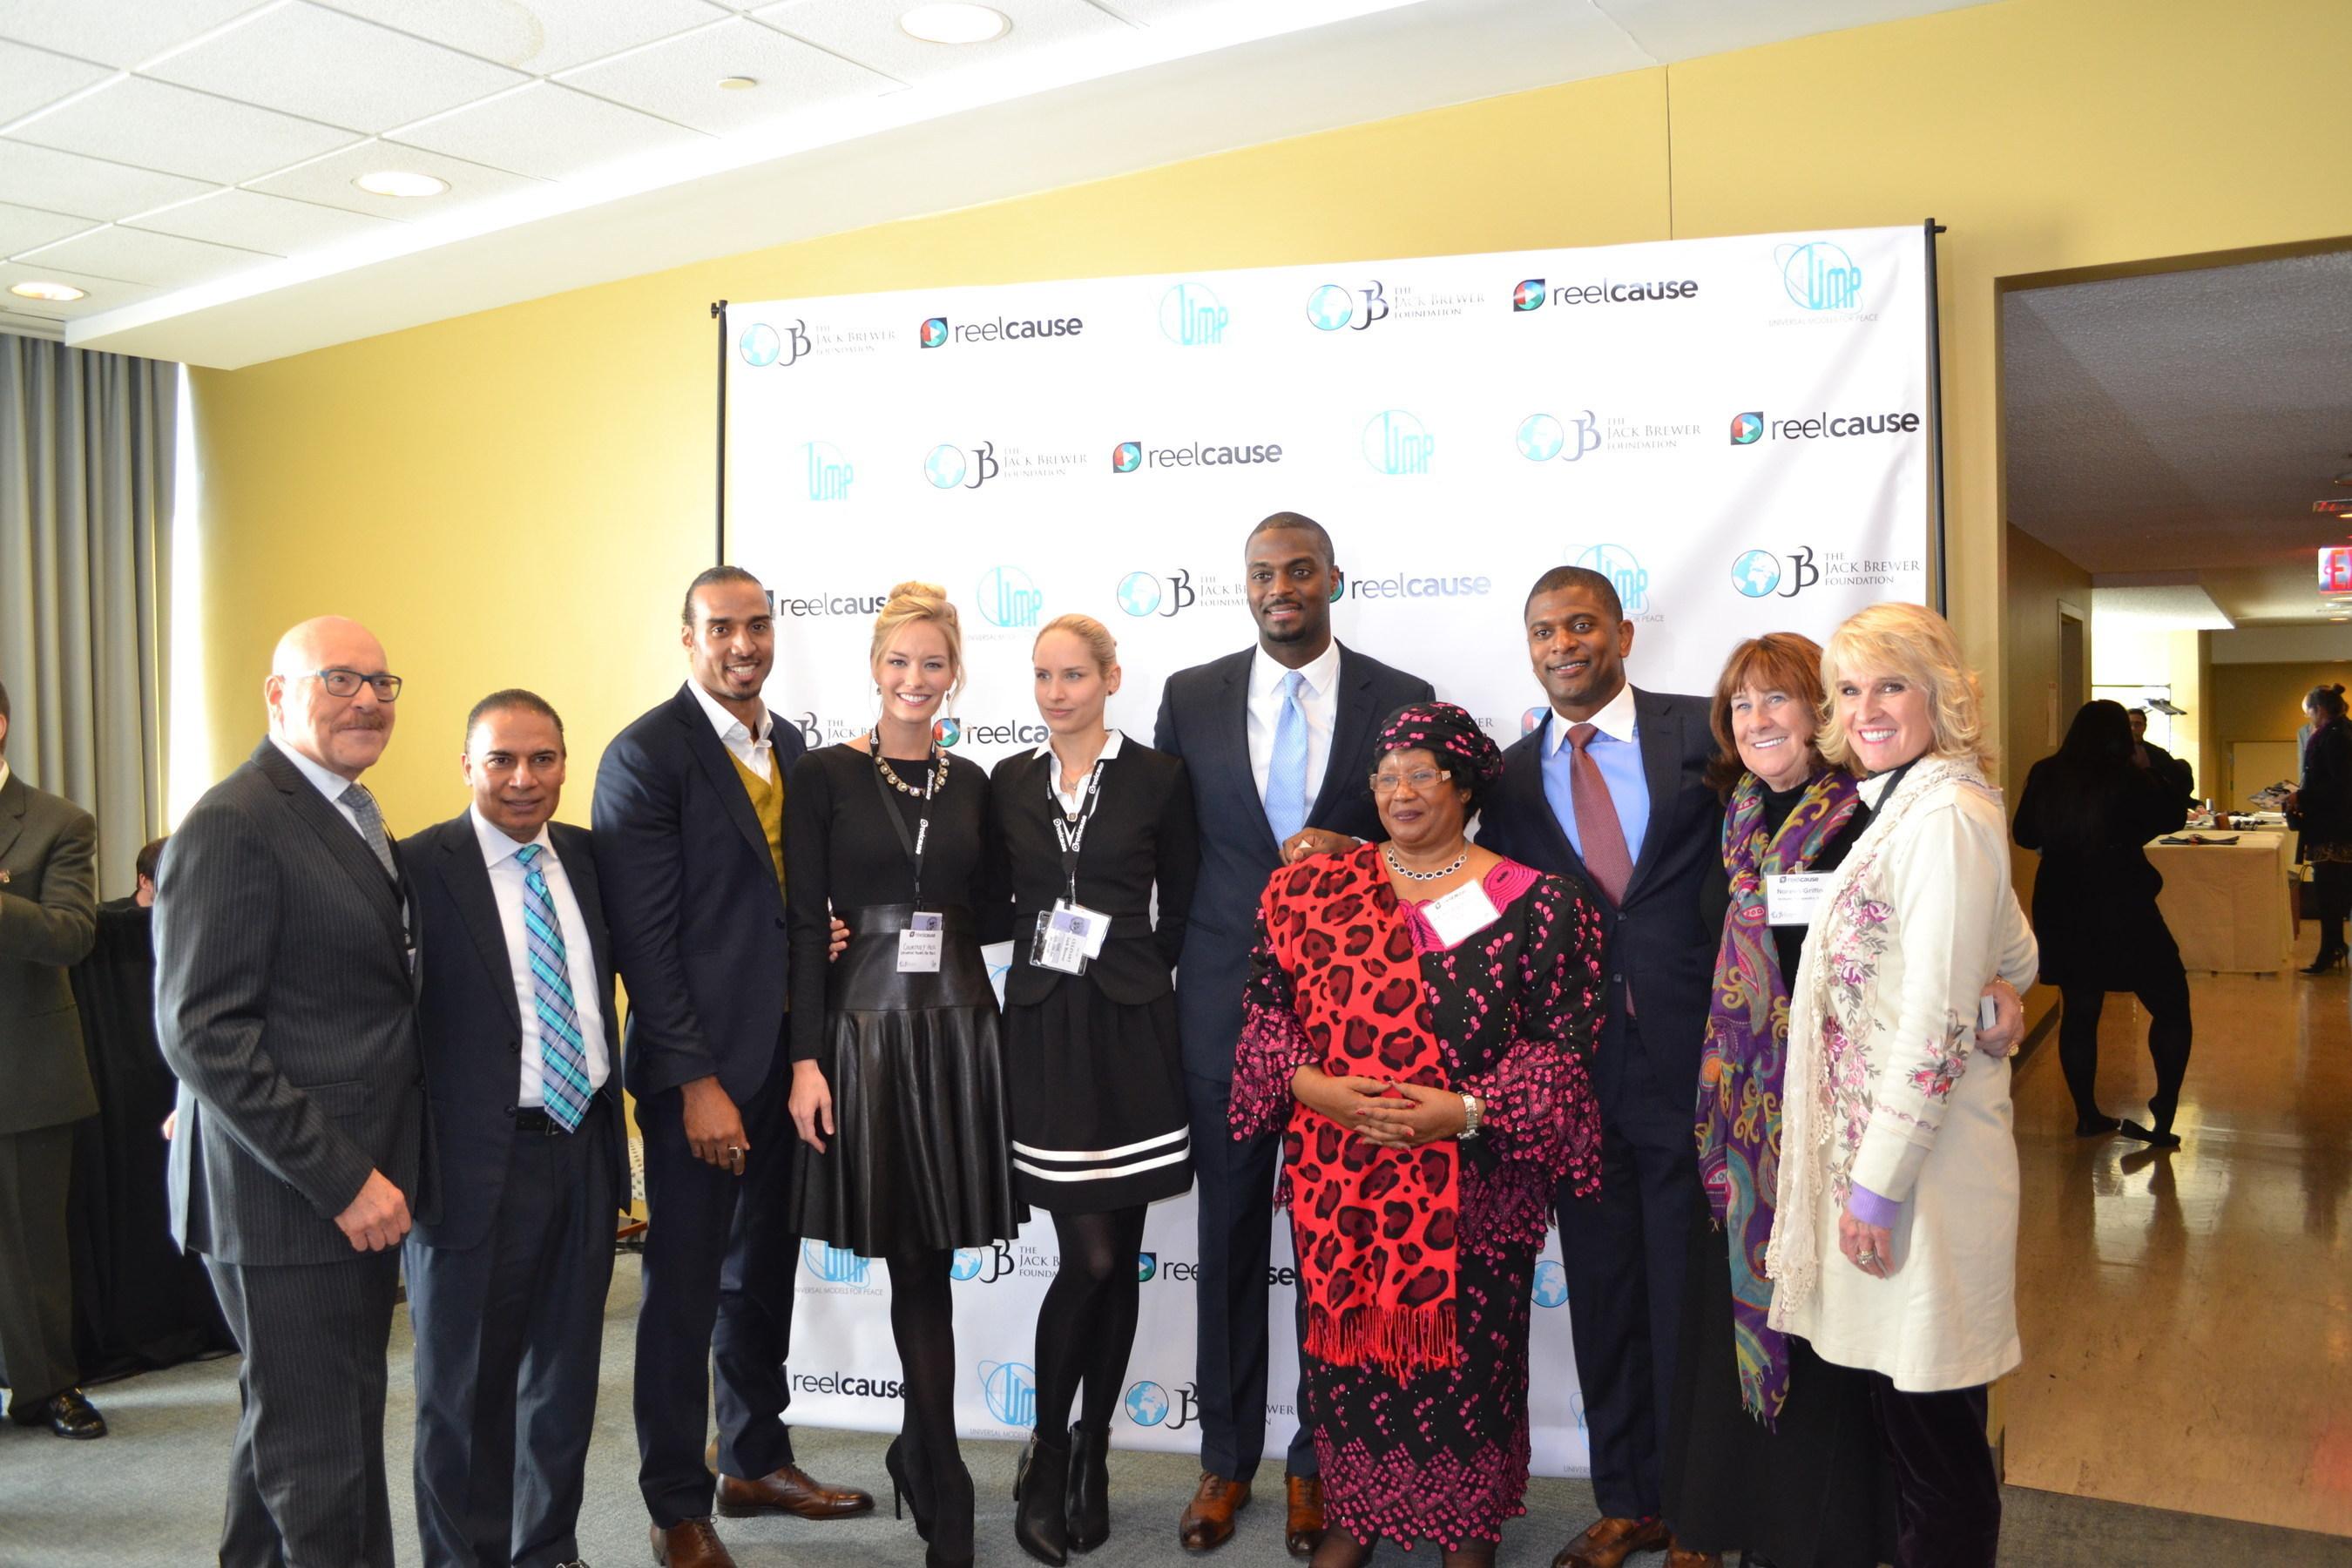 Left to right:  Michael Jacobson, Bobby Kumar Kalotee, Ryan Grant, Courtney Hejl, Sara Hirsch, Plaxico Burress, H.E. Dr. Joyce Banda, Ambassador Jack Brewer, Noreen Griffin, Lynda Blanchard